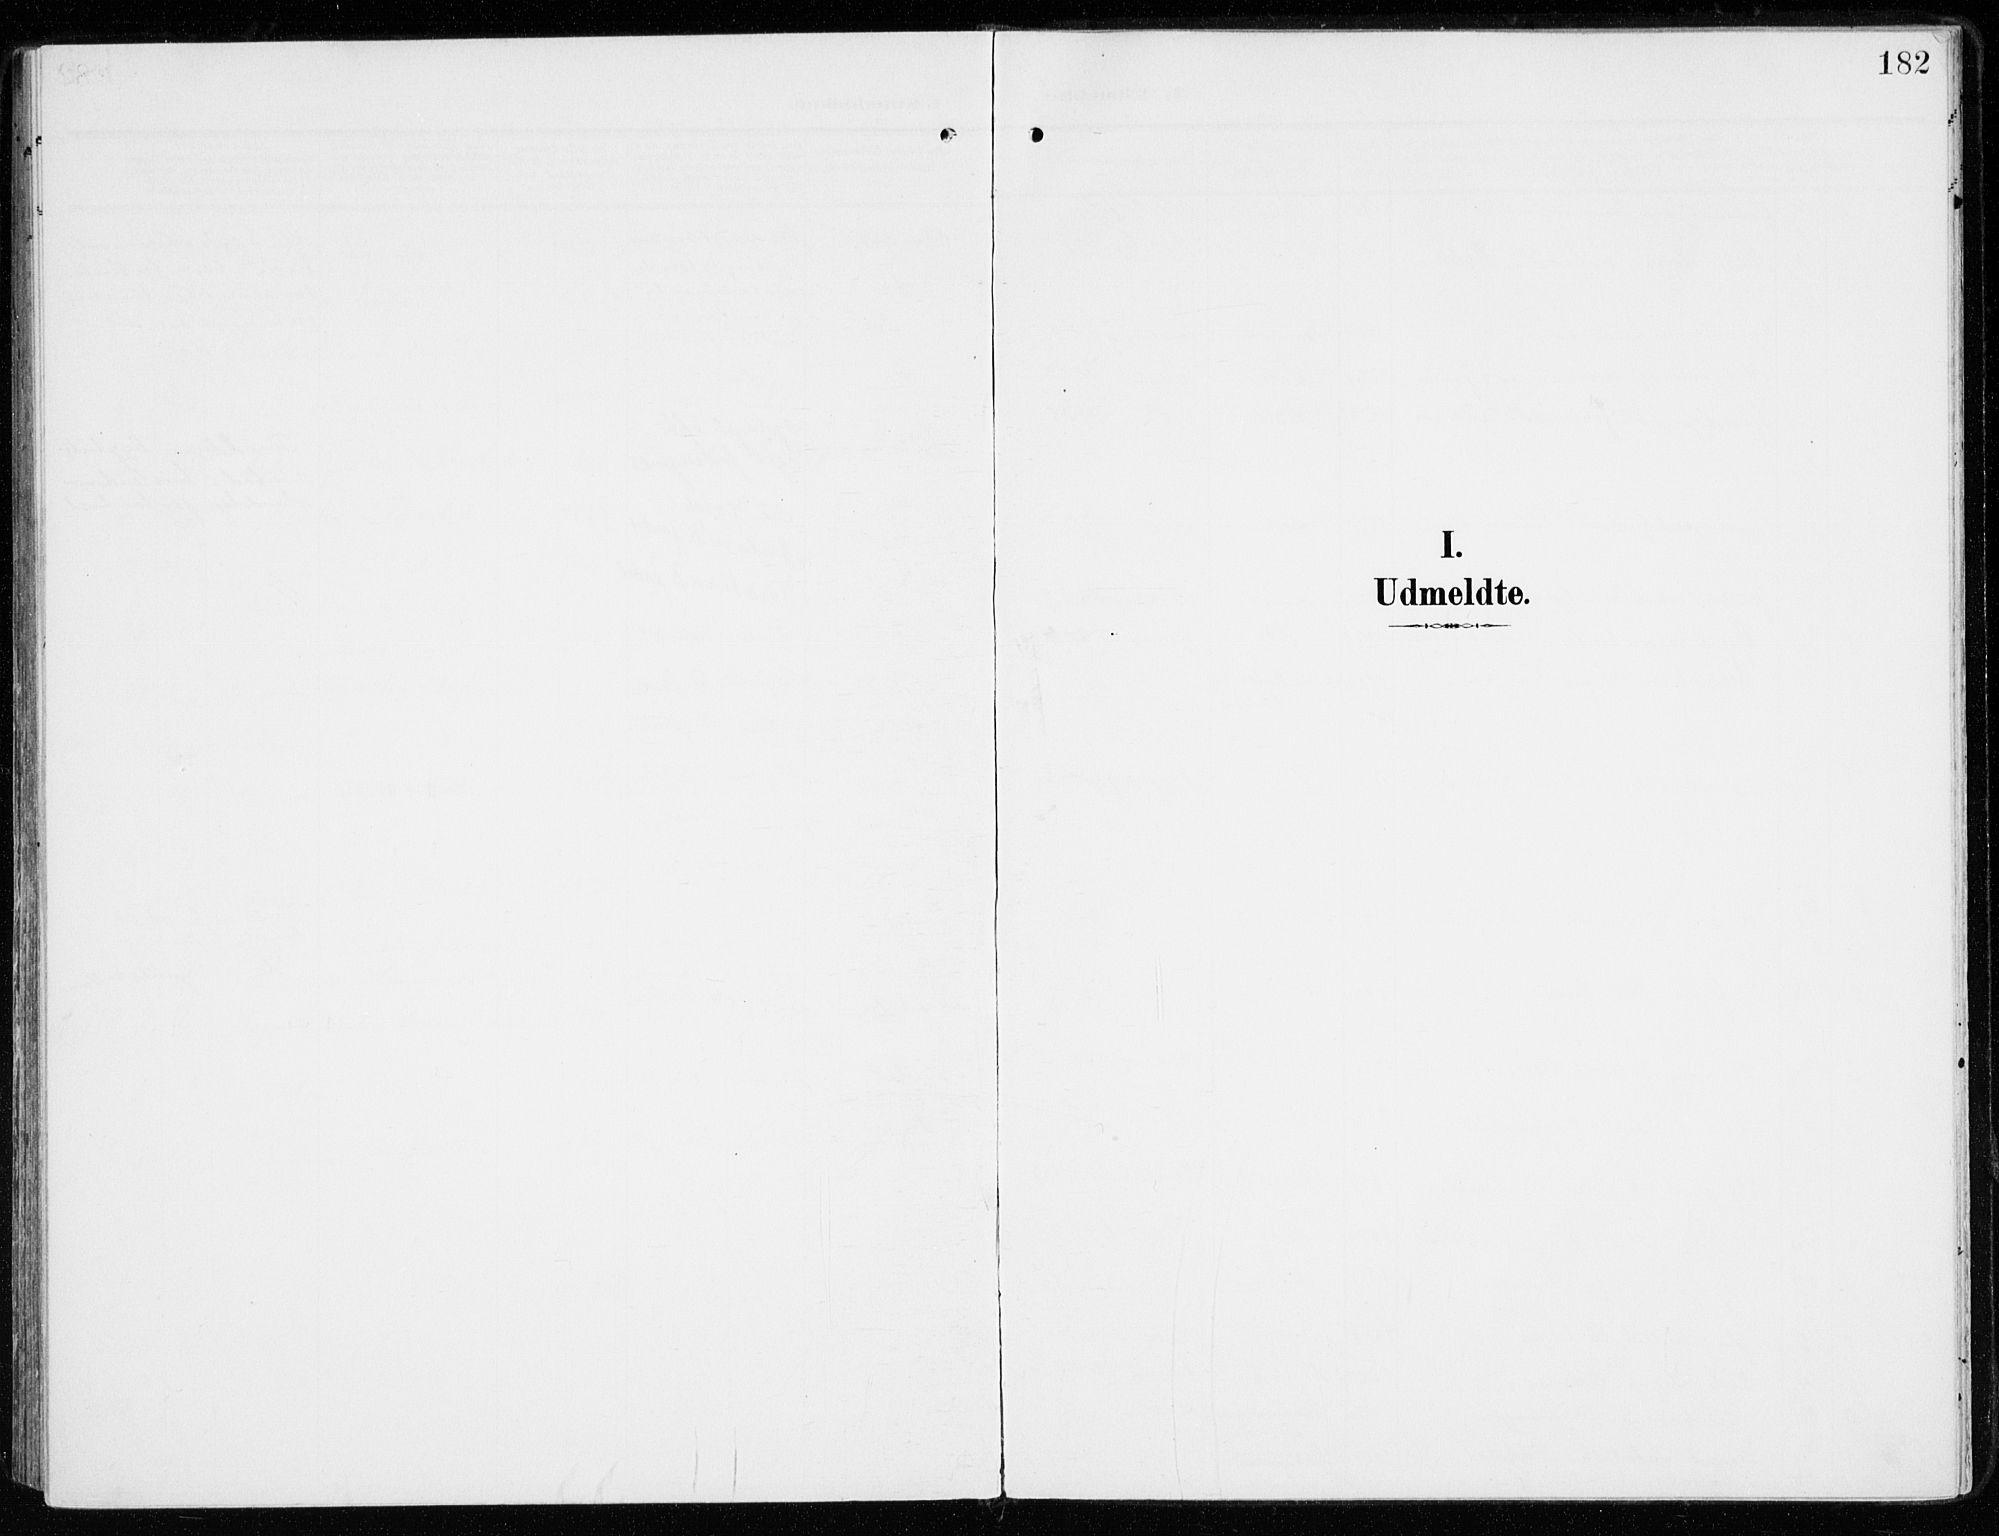 SAH, Sel prestekontor, Ministerialbok nr. 2, 1905-1919, s. 182